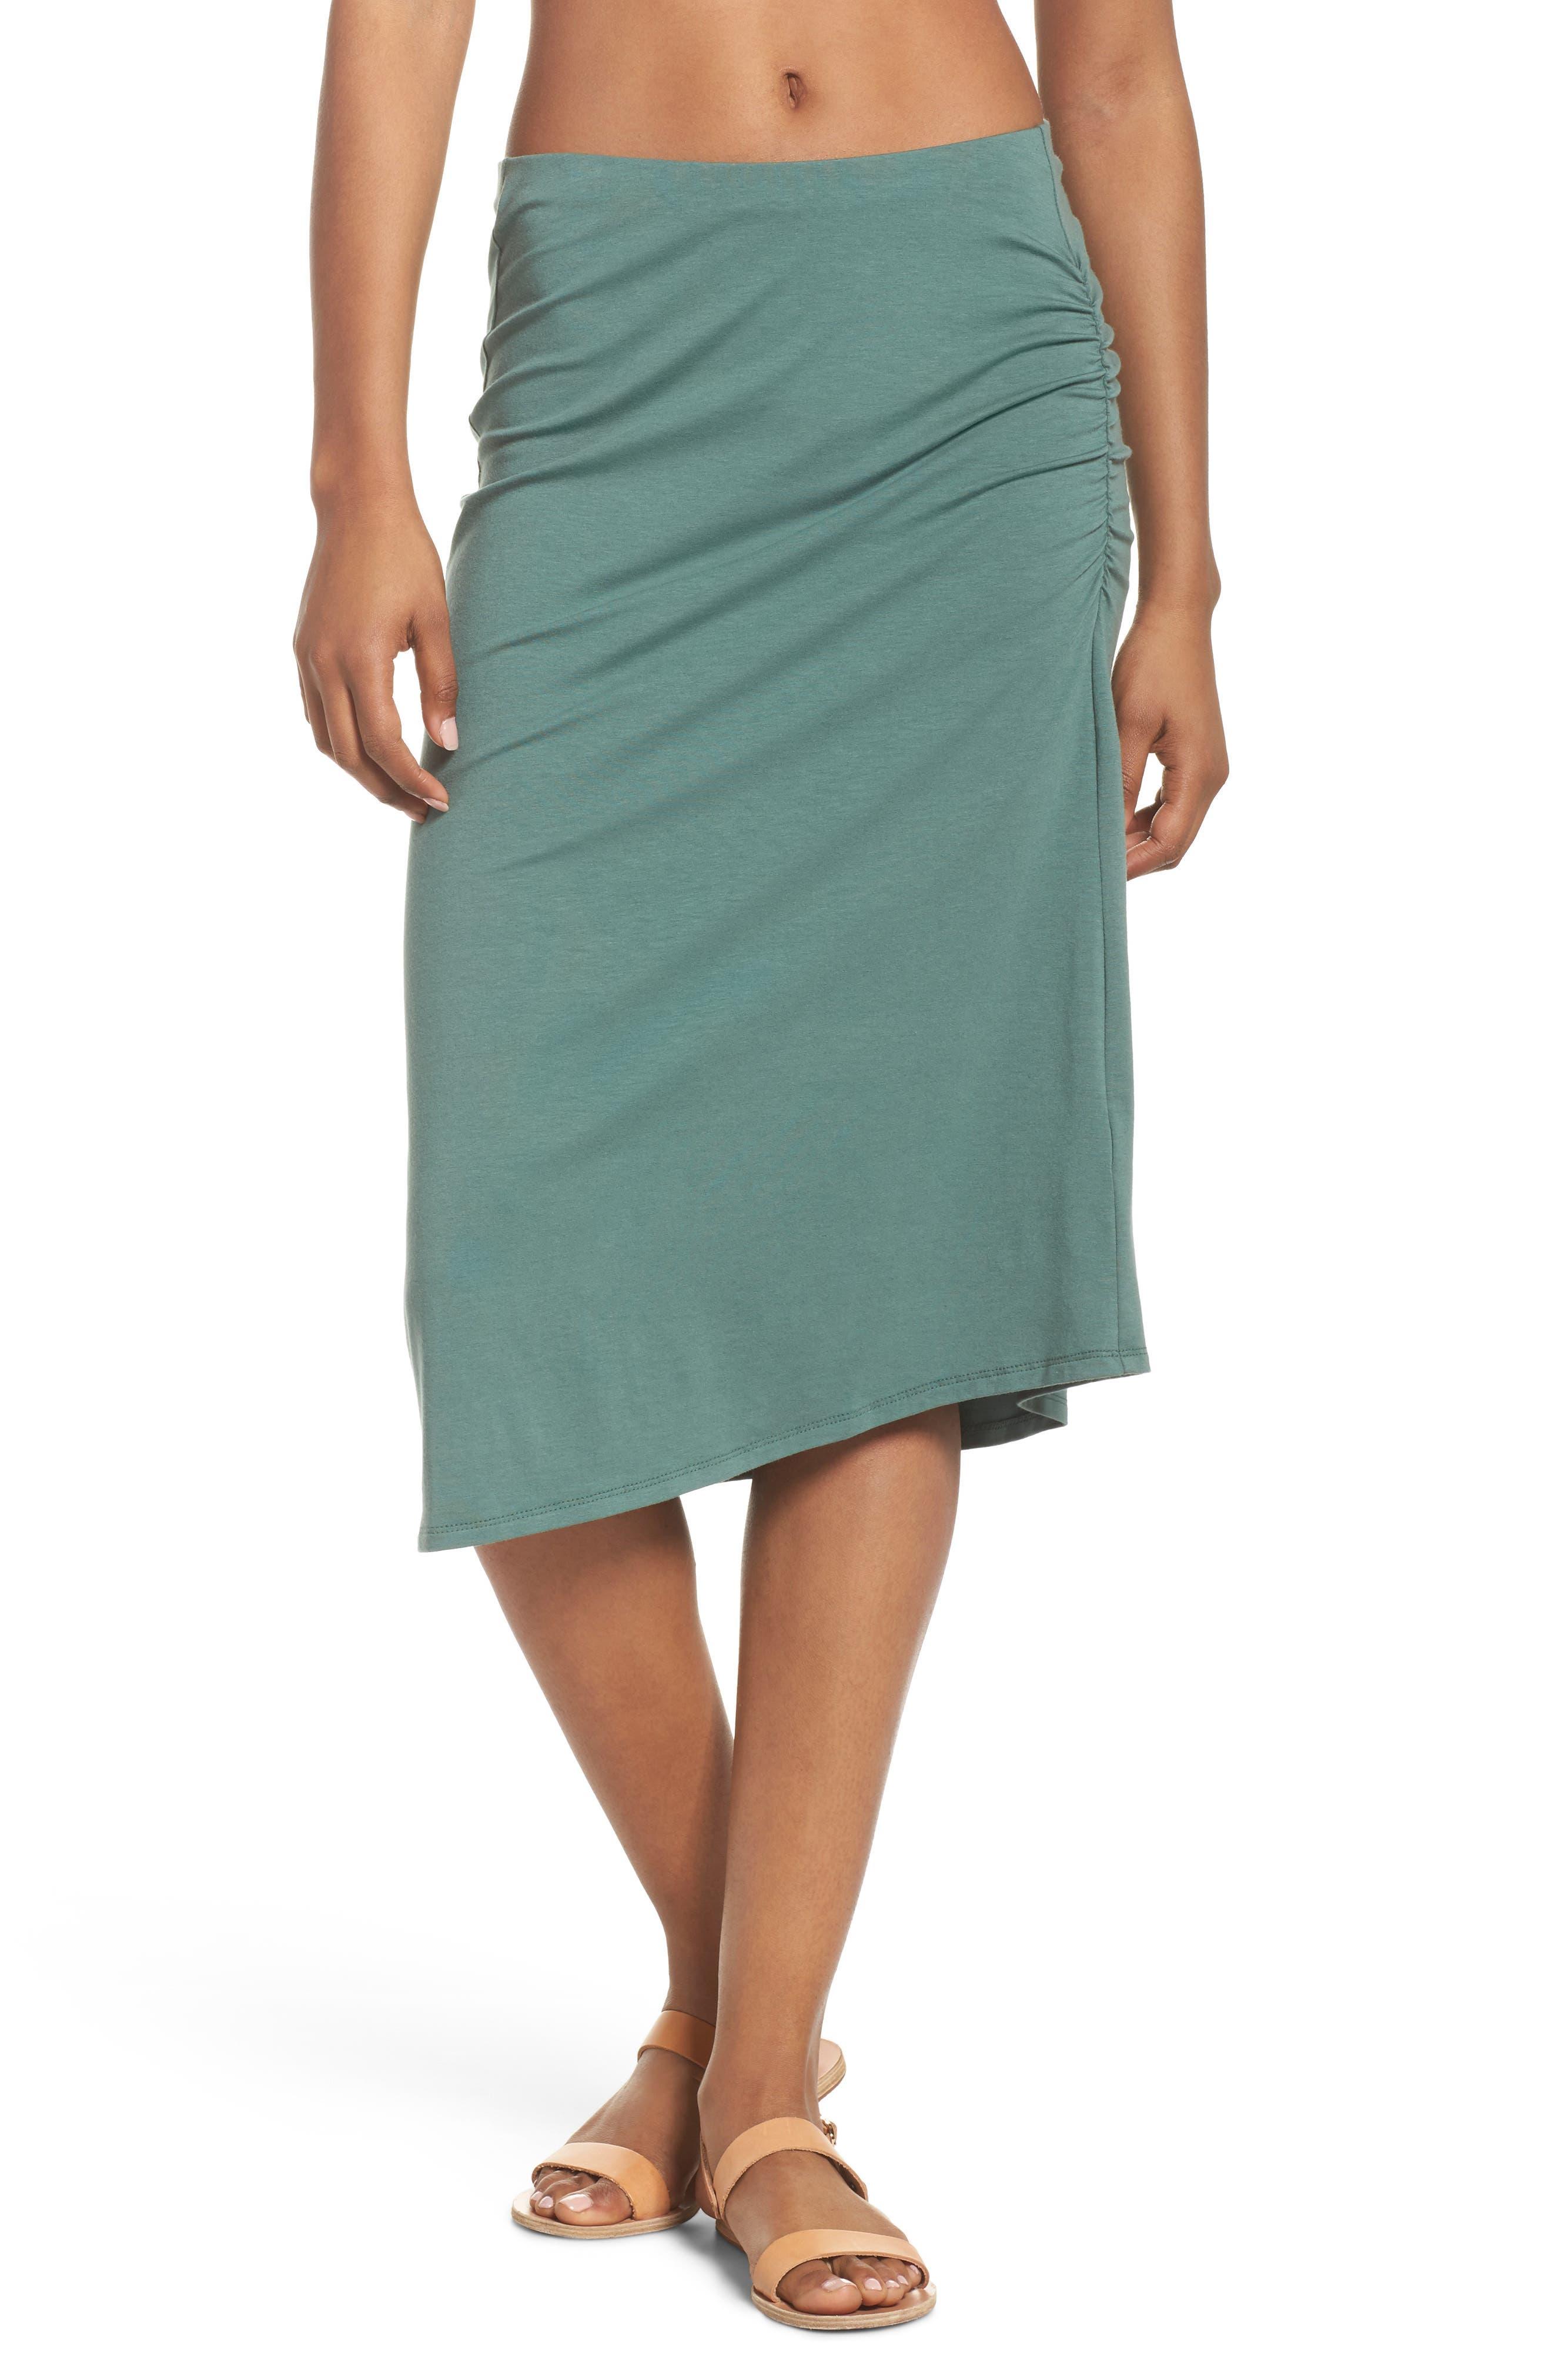 Dream Song Skirt,                             Main thumbnail 1, color,                             300